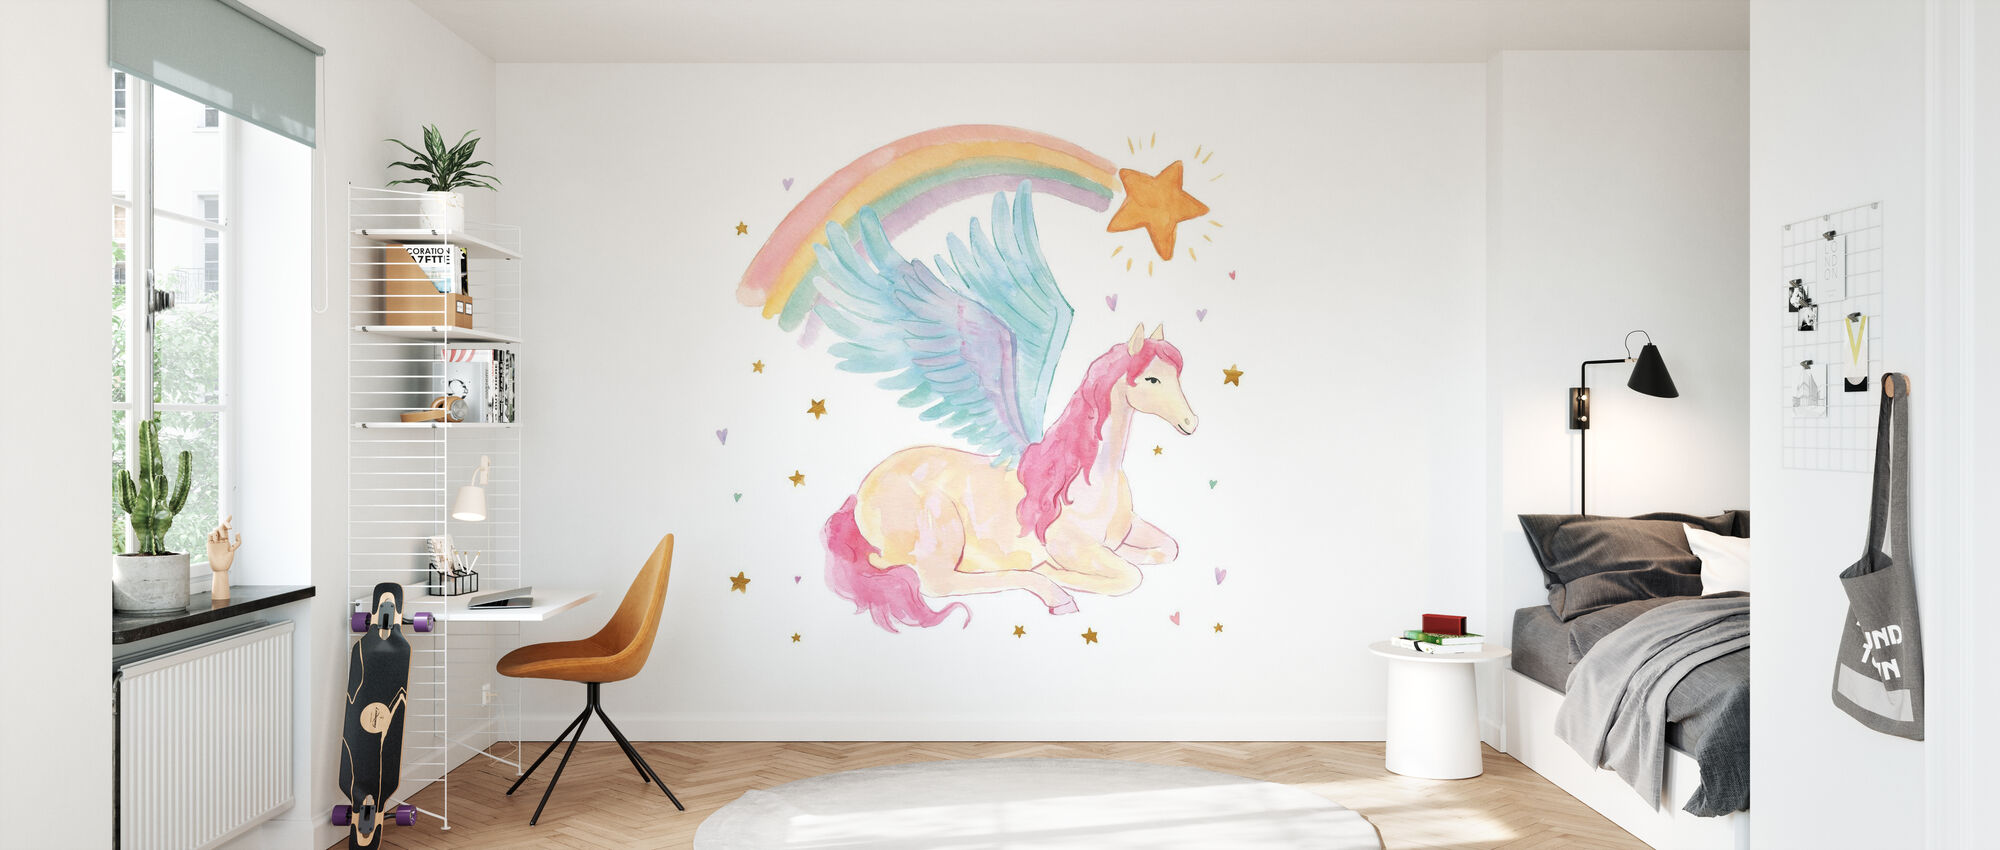 Magical Friends II - Wallpaper - Kids Room